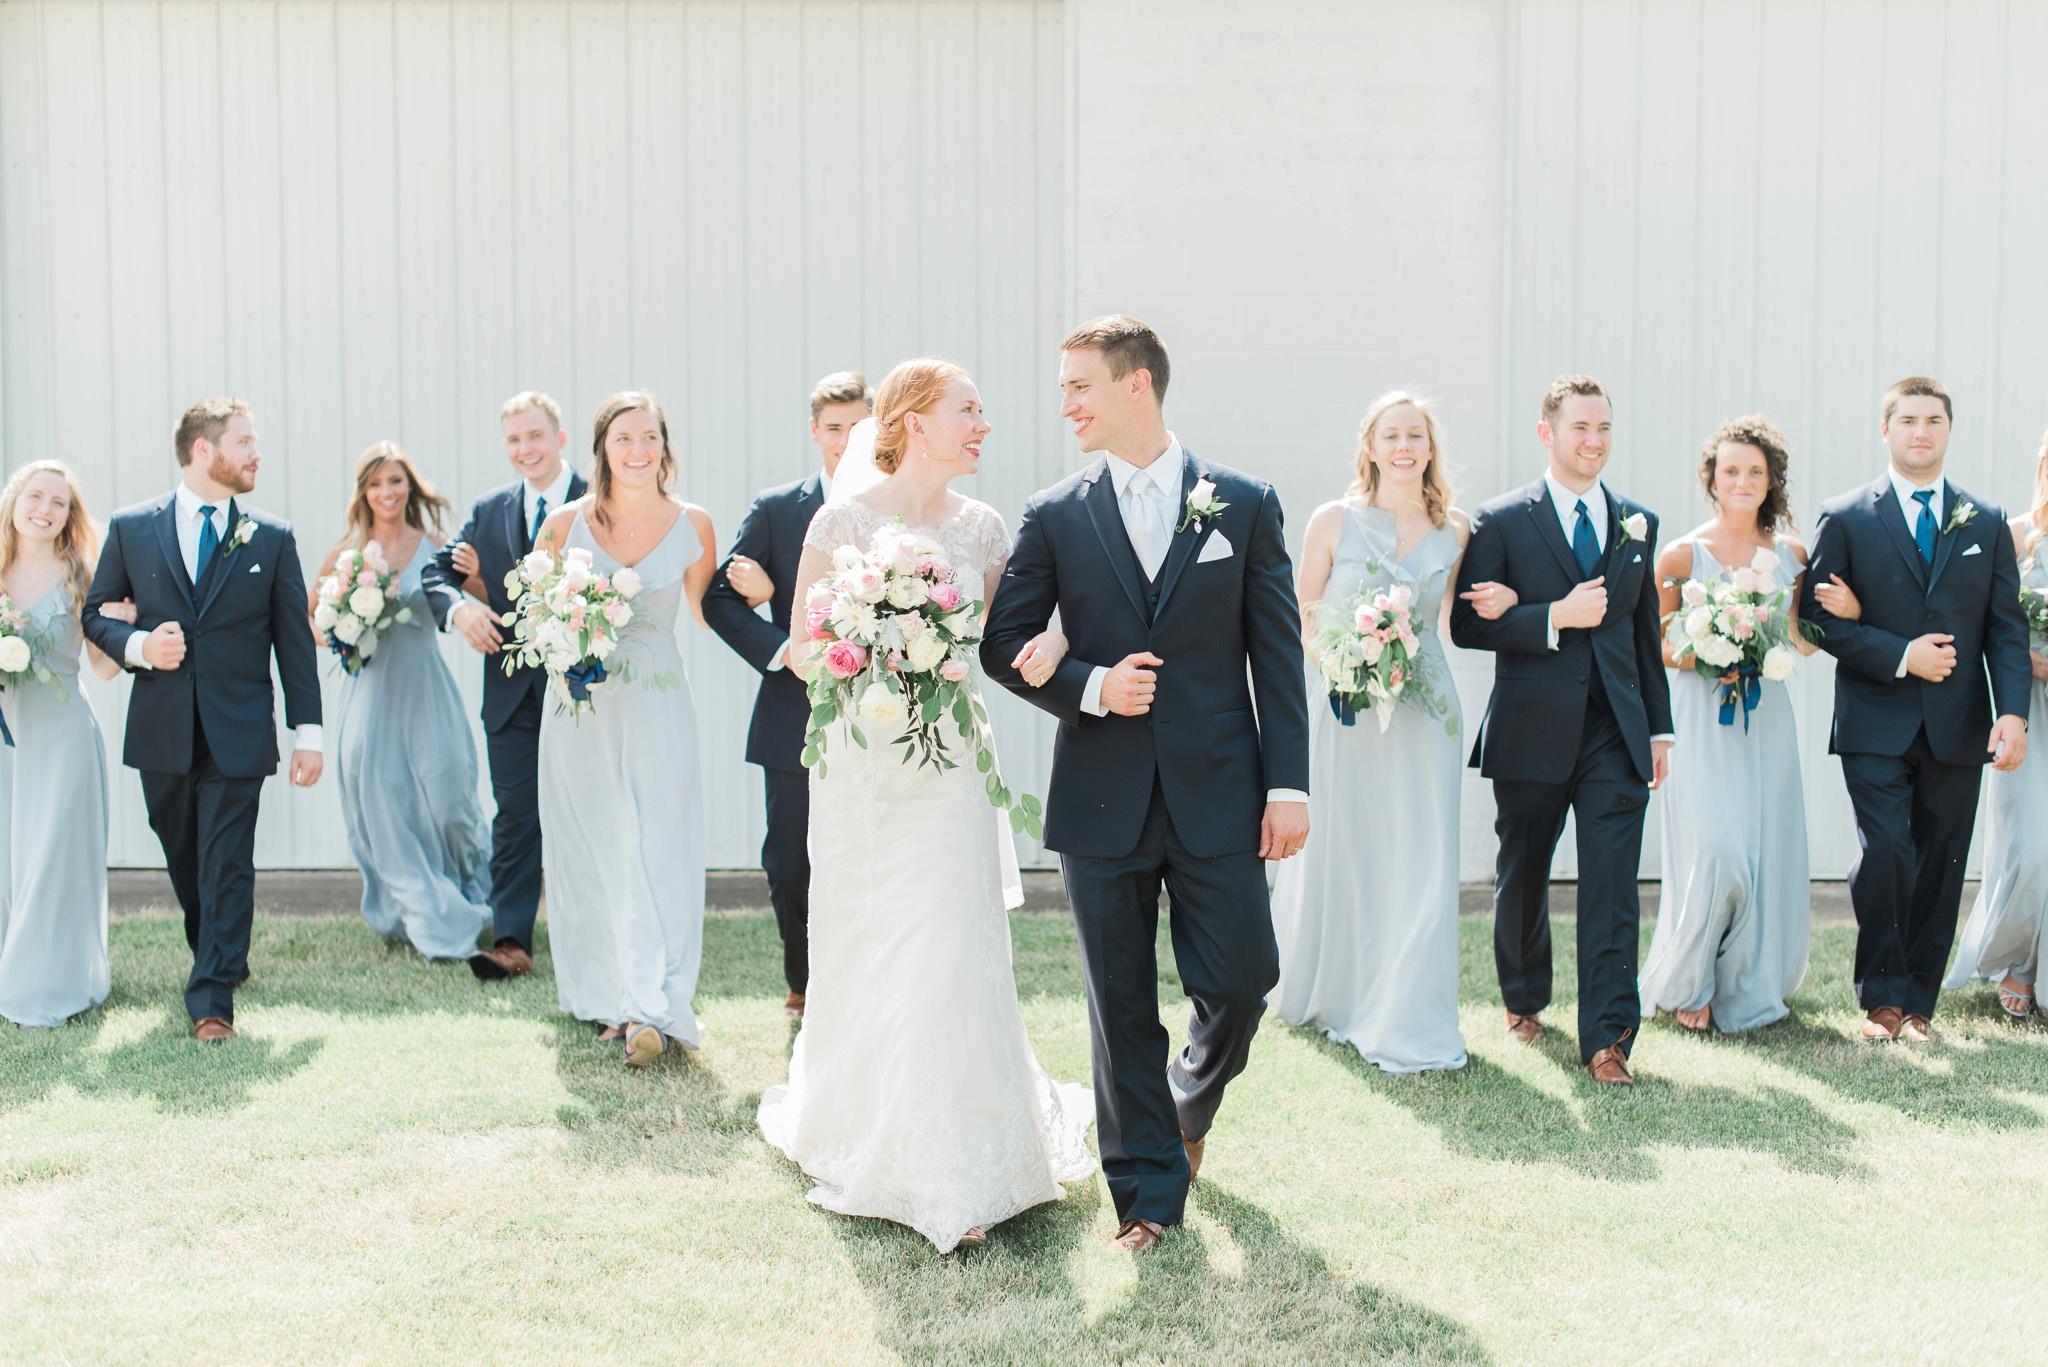 sunbury-ohio-wedding-hannah-johnathan_0072.jpg